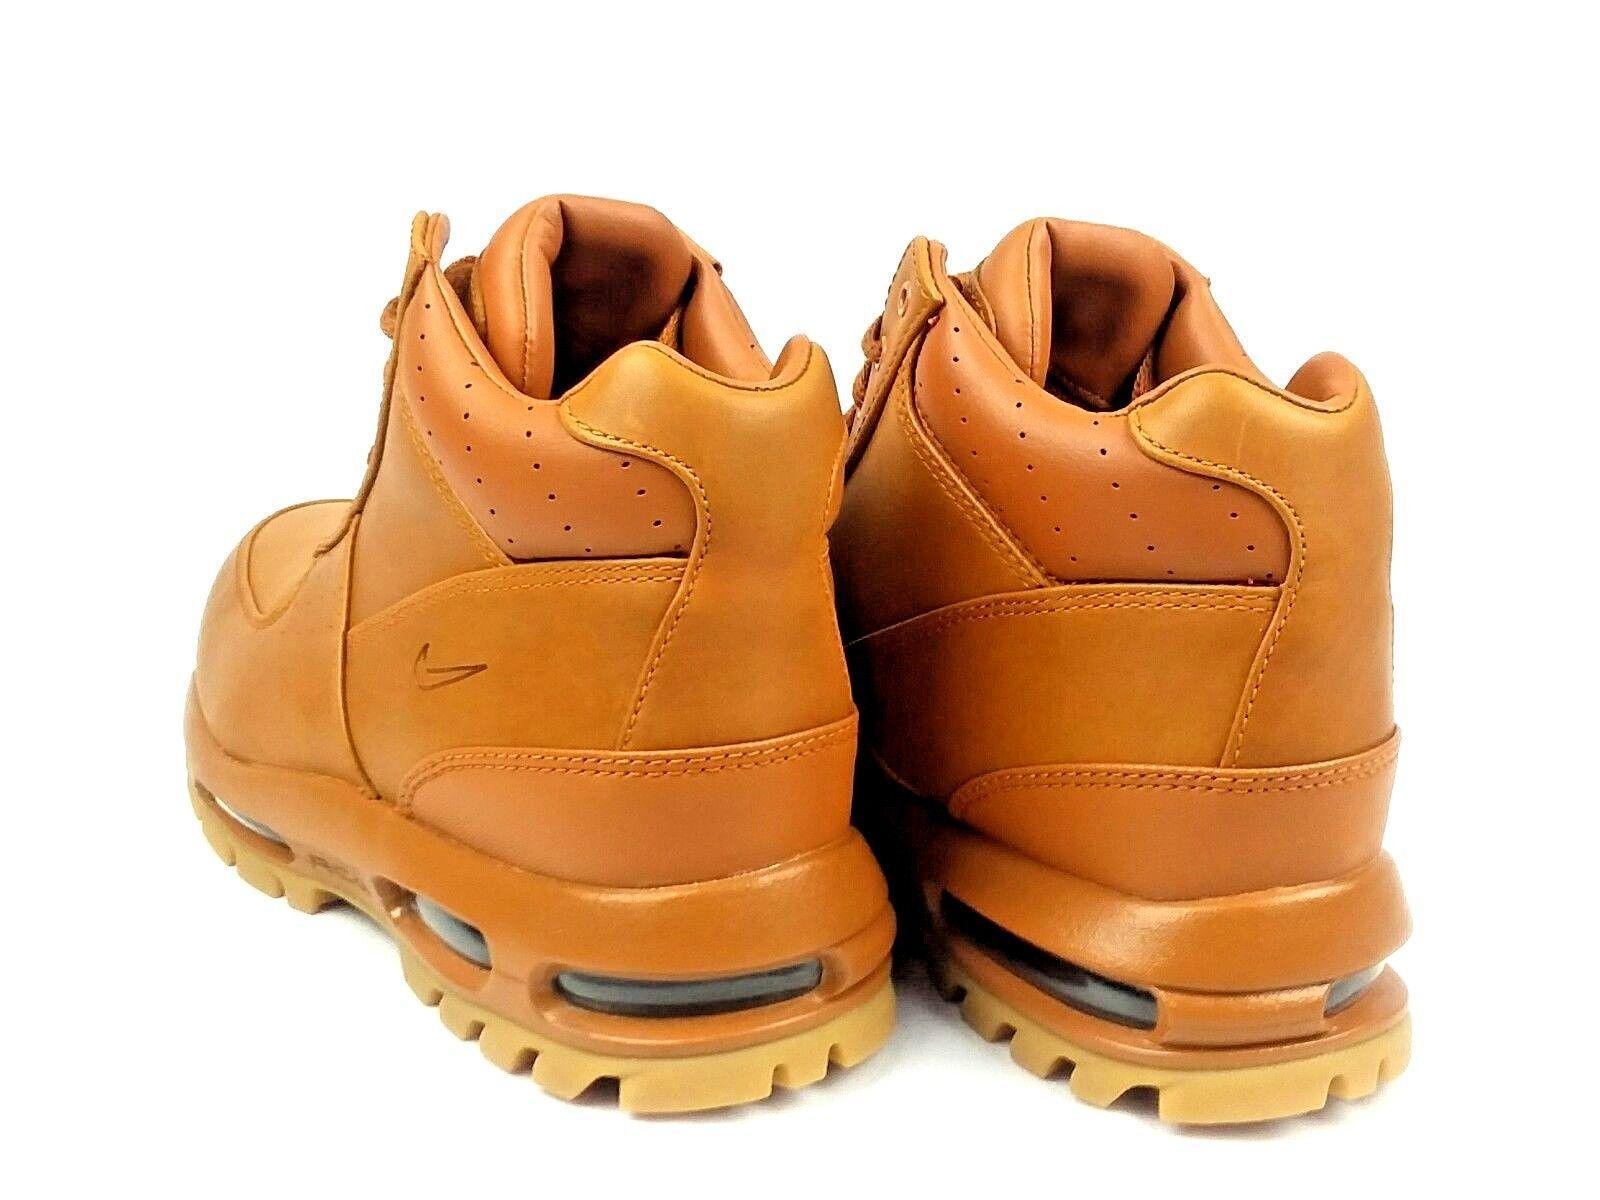 d7d80bf458f111 Nike Air Max Goadome Boots Tawny Gum Light Brown ACG 865031 208 Mens Size  7.5